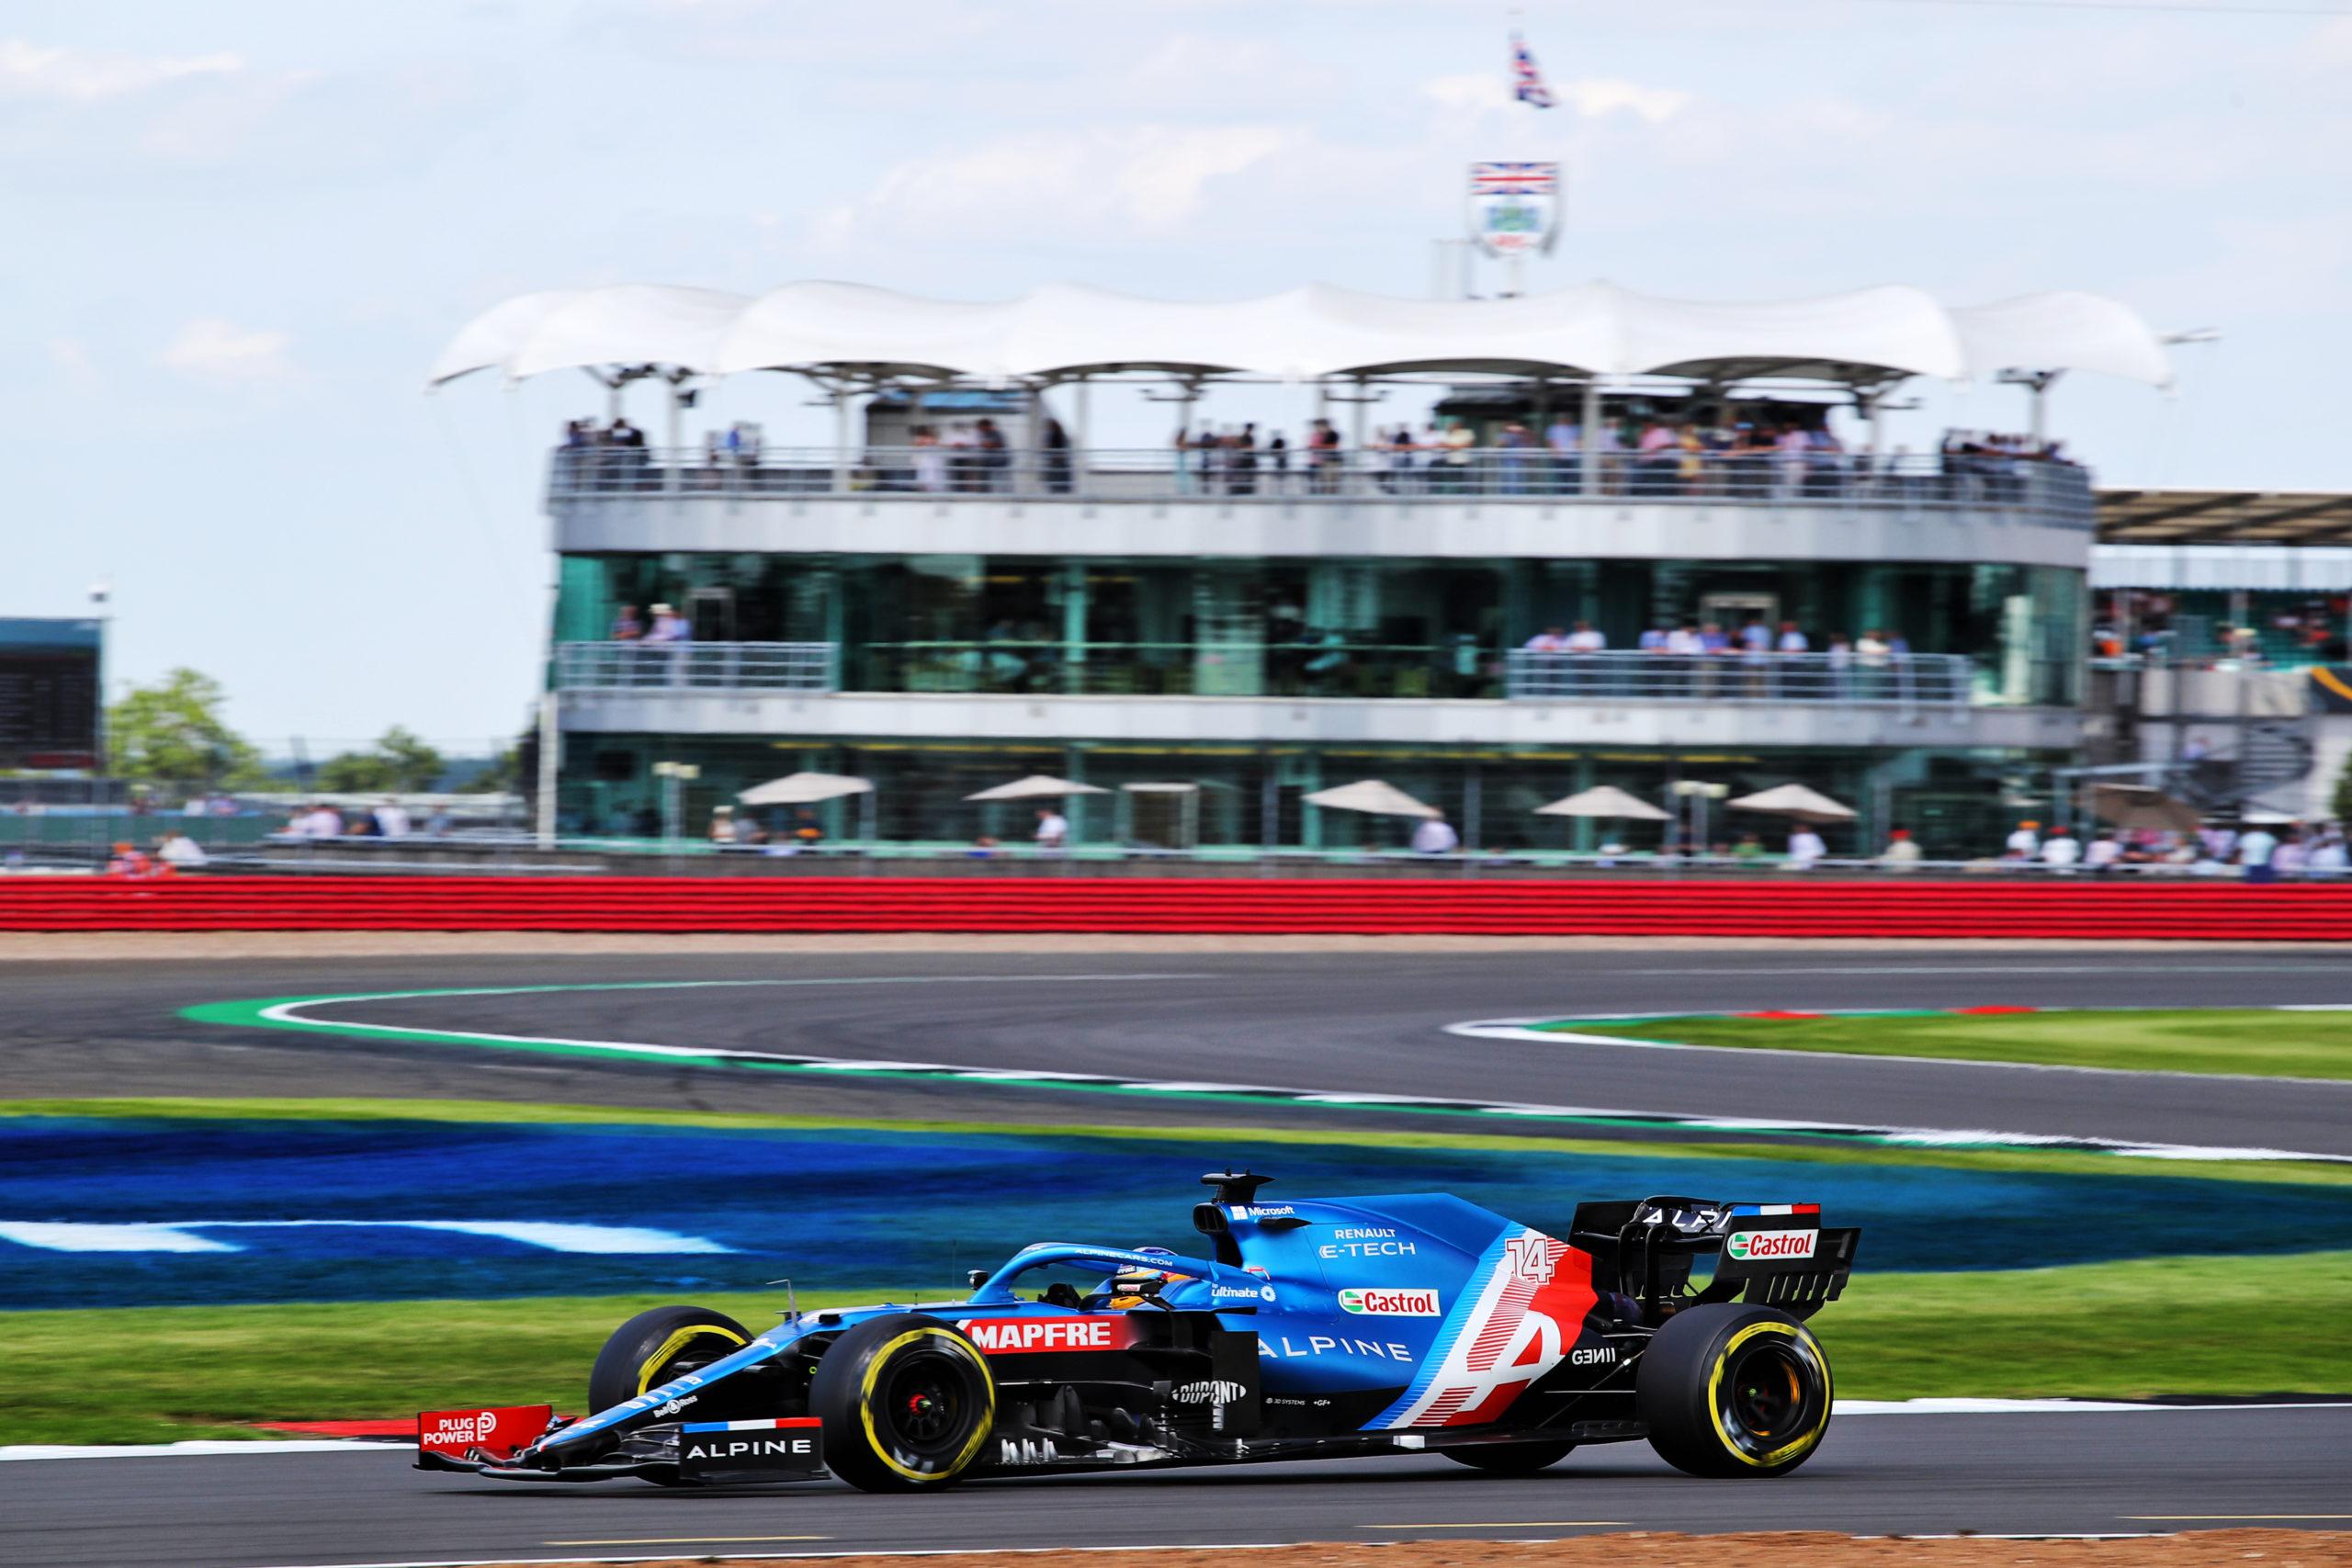 NORTHAMPTON, ENGLAND - JULY 16: Fernando Alonso of Spain. Alpine F1 Team, British GP 2021.